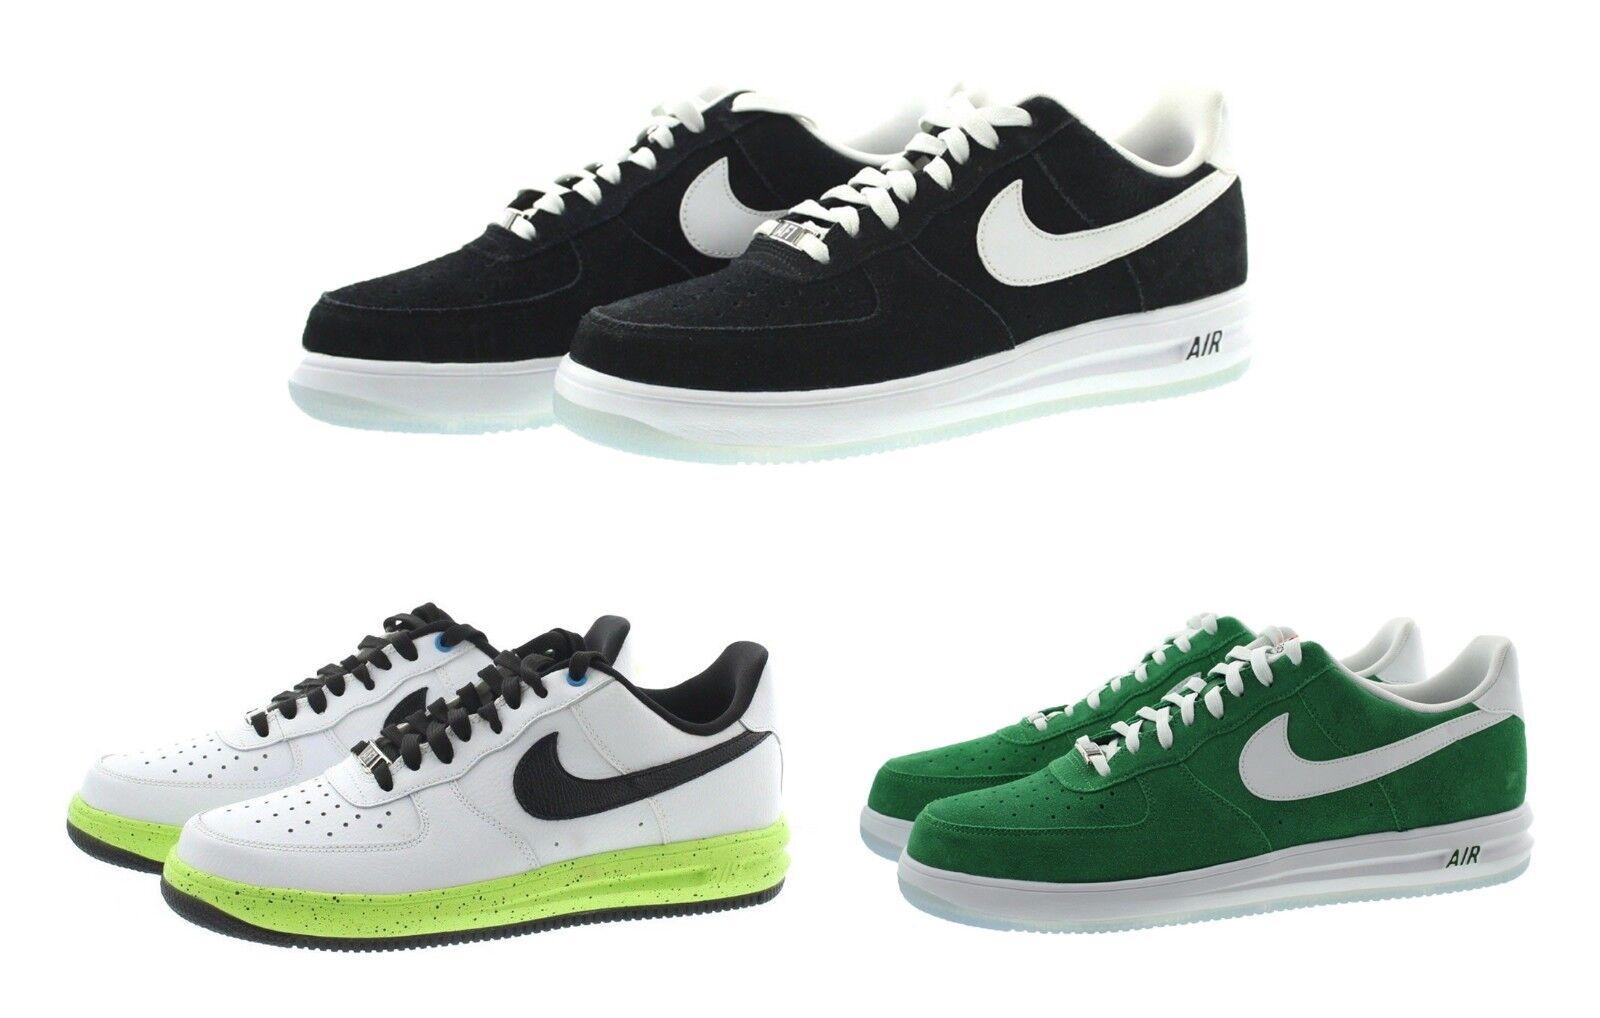 Nike air force 1 af1 top lunar 654256 männer niedrige top af1 - lifestyle - casual schuhen turnschuhe b66319